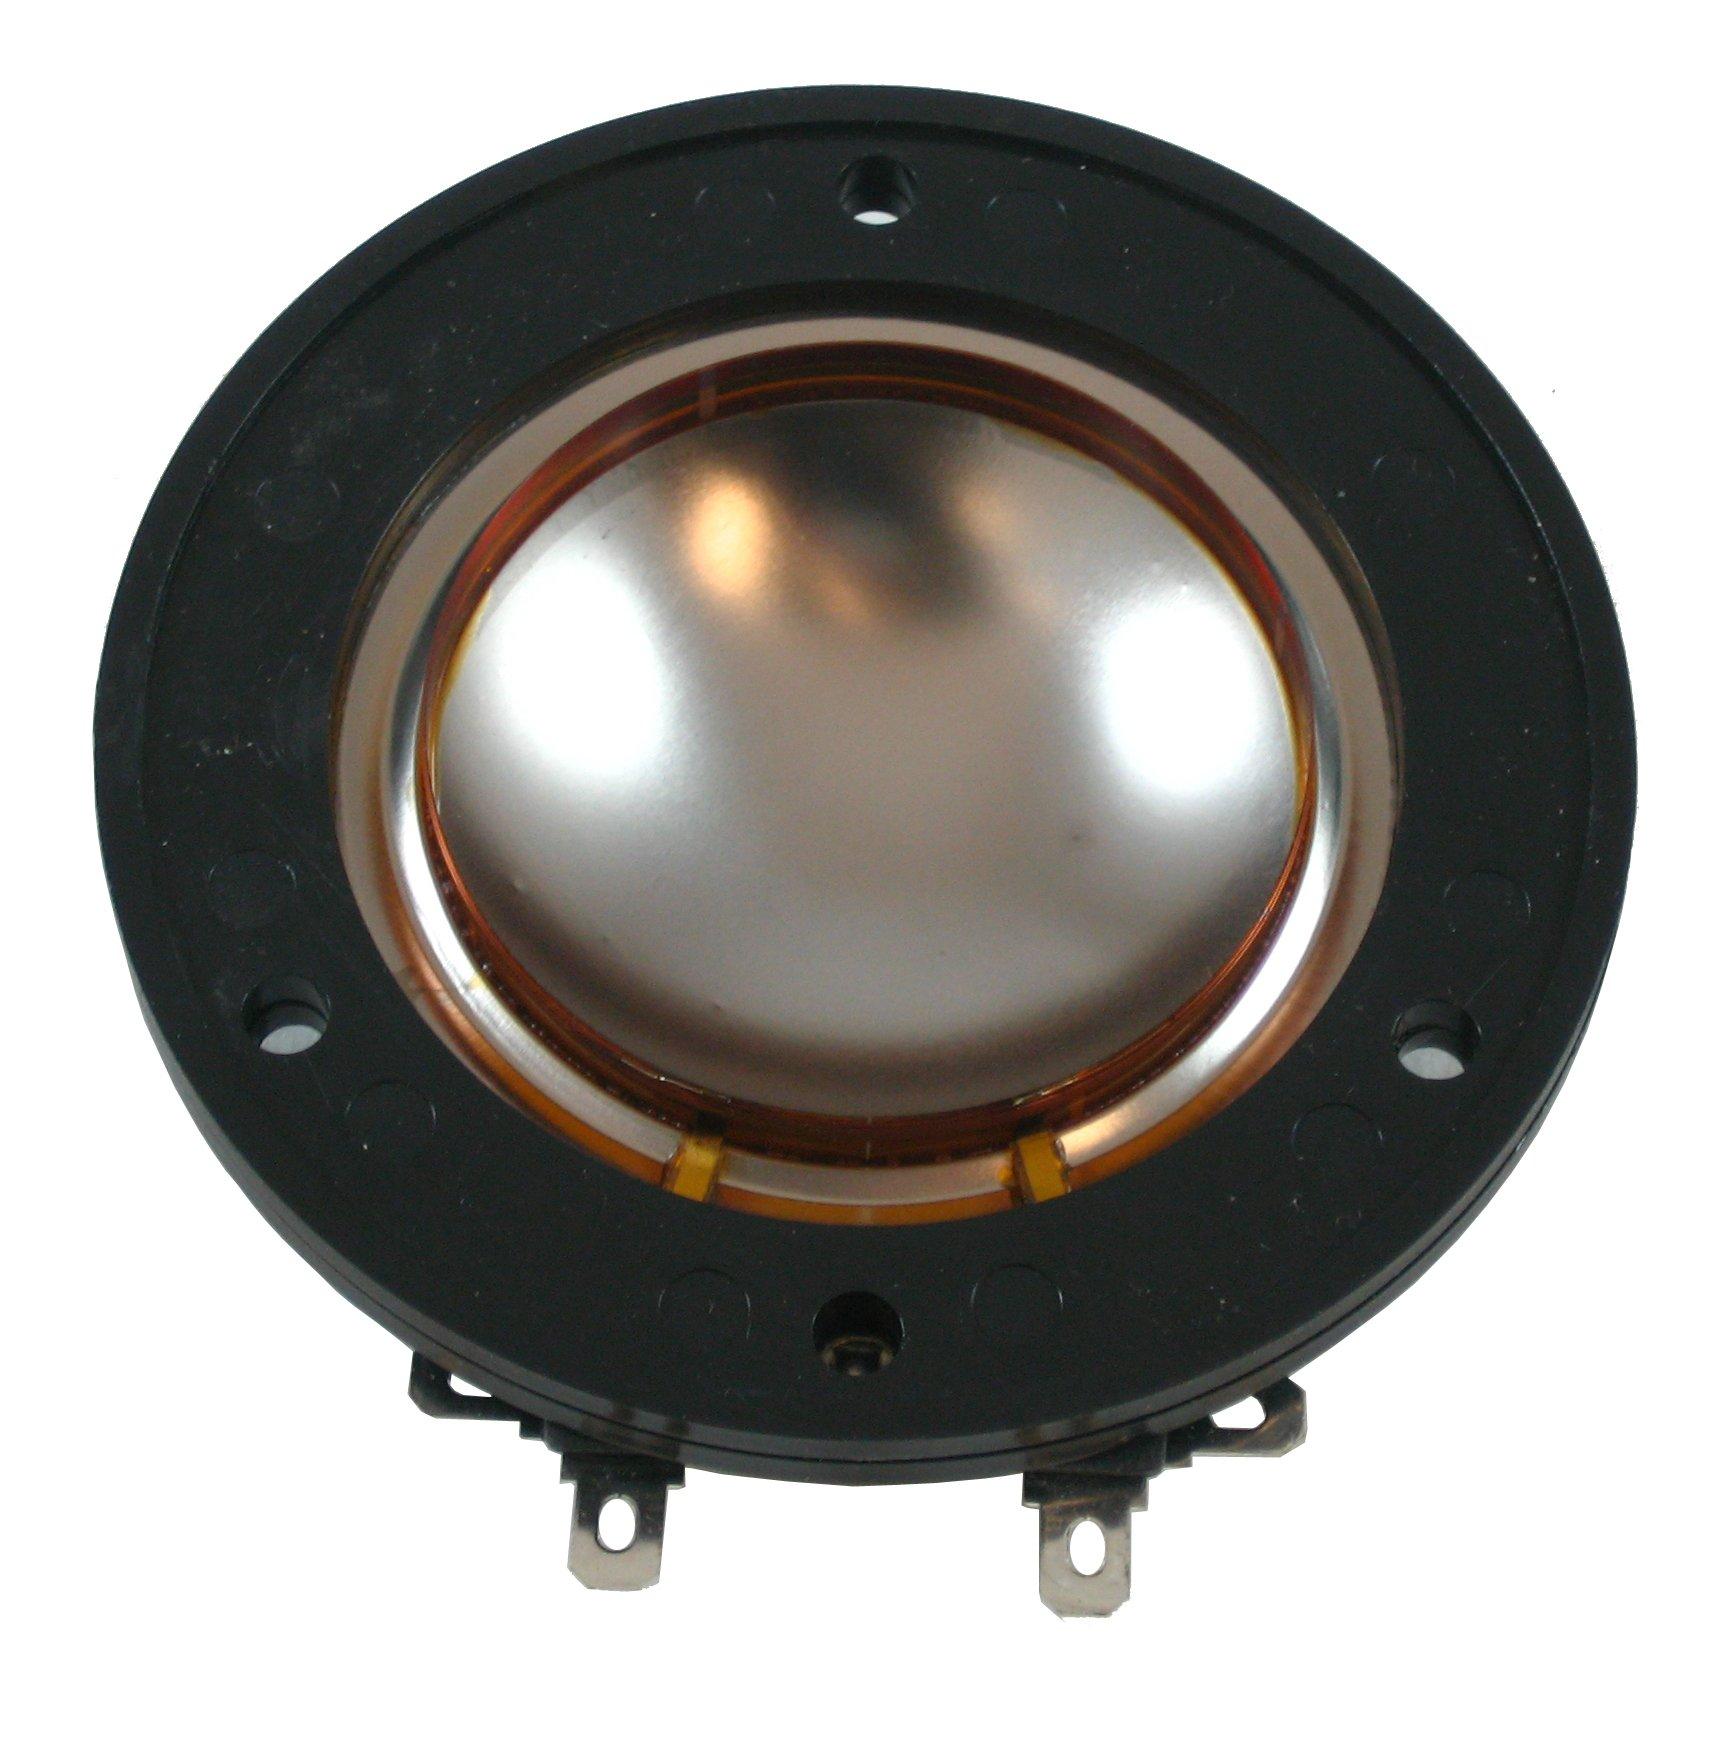 Blast King I72BDUM200DIA Horn Driver 2-Inch Replacement Diaphragm for 172BDUM200